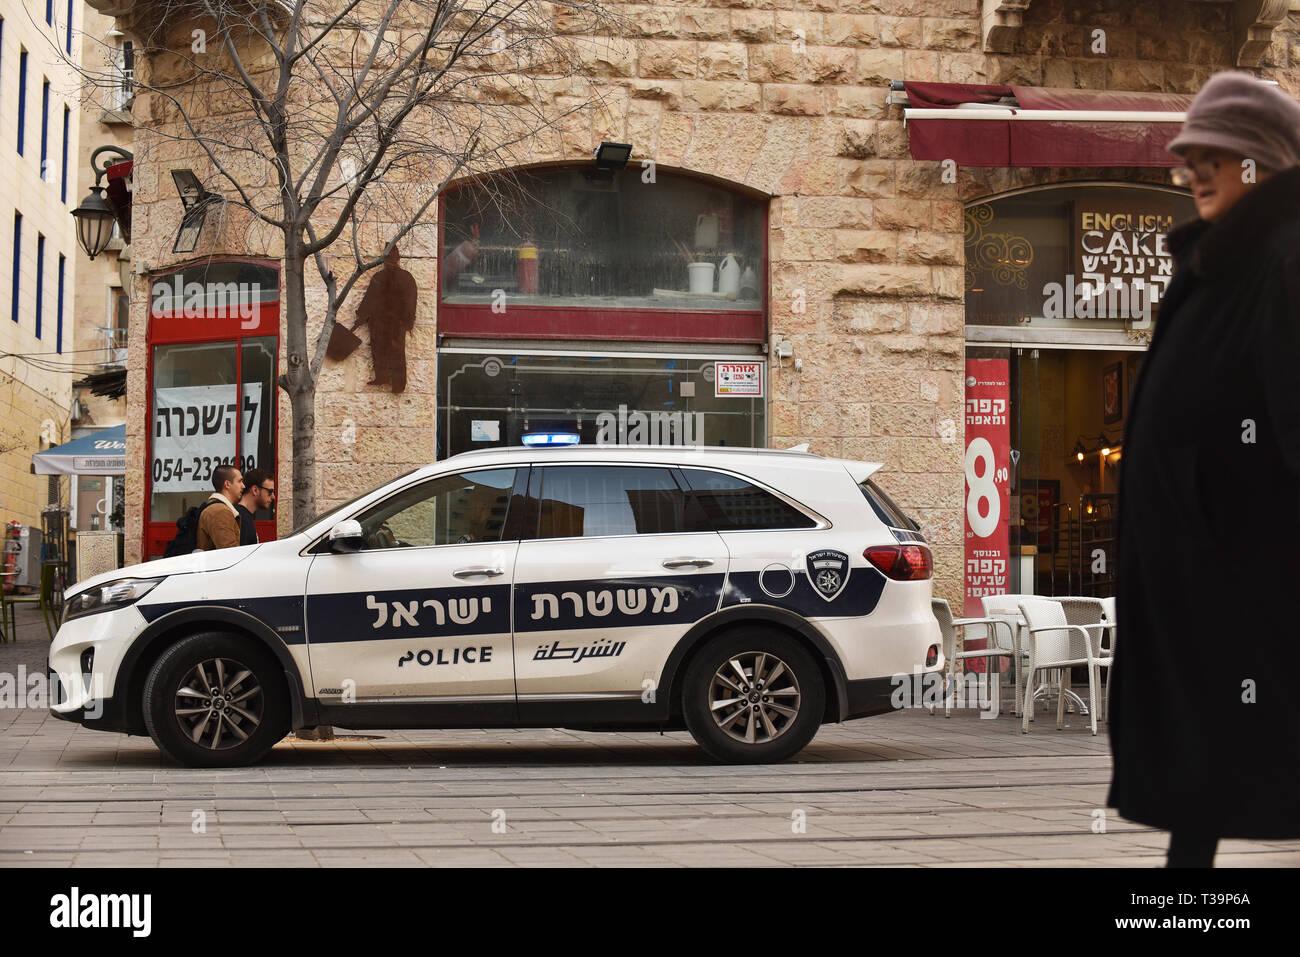 Police car in Jaffa street, Jerusalem, Israel - Stock Image